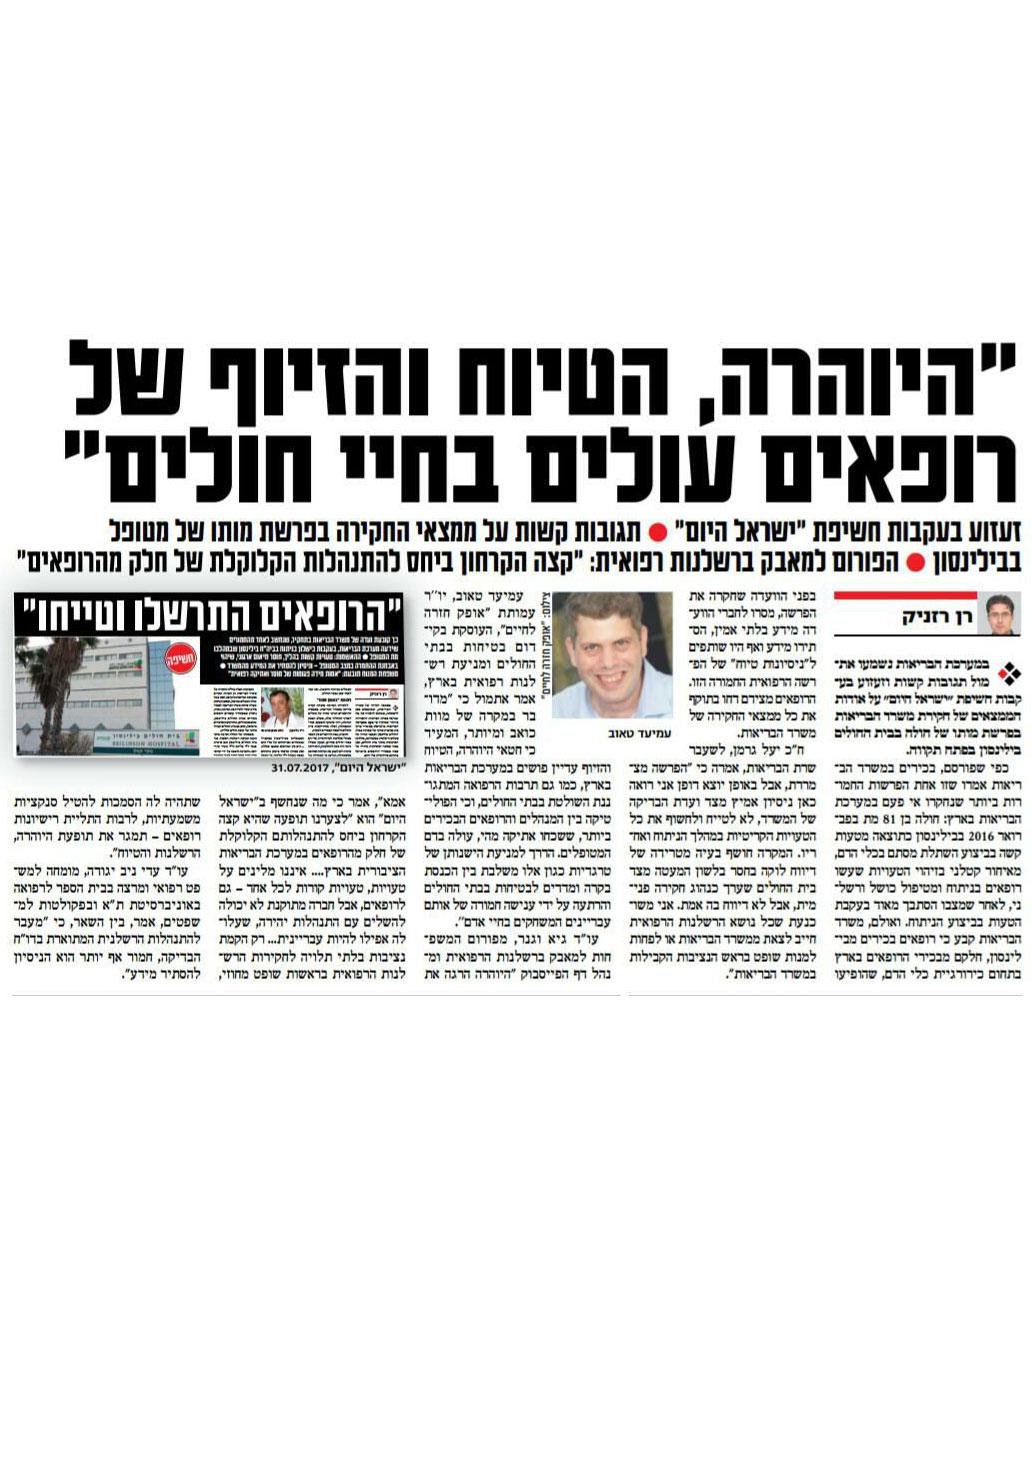 2017-08-01-israel-hayom1